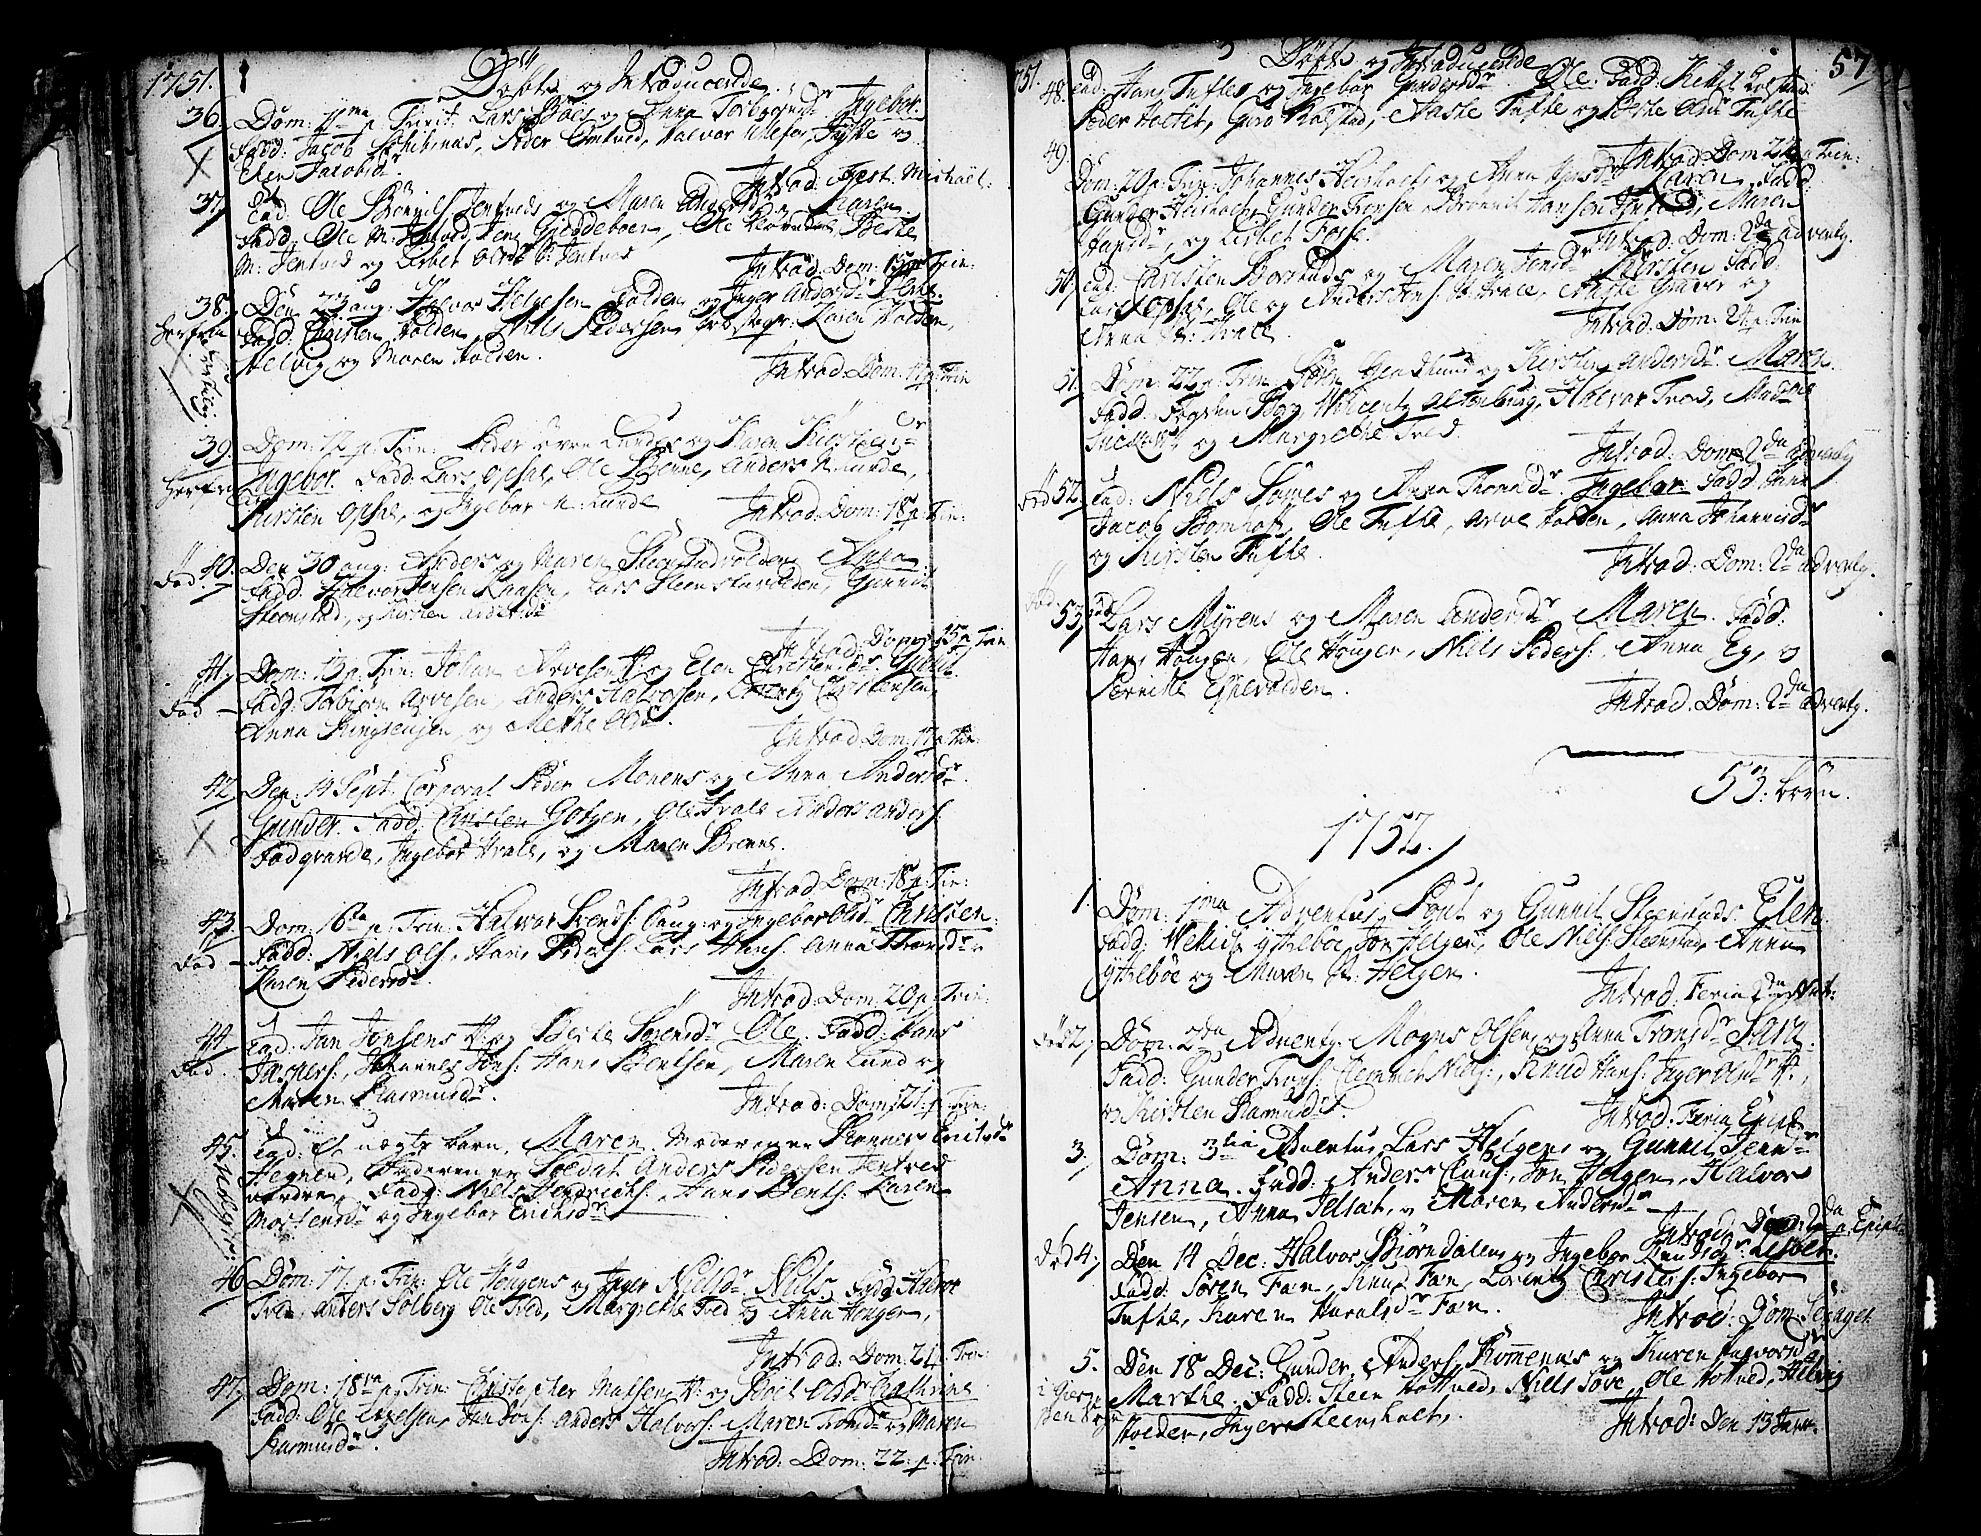 SAKO, Holla kirkebøker, F/Fa/L0001: Ministerialbok nr. 1, 1717-1779, s. 57